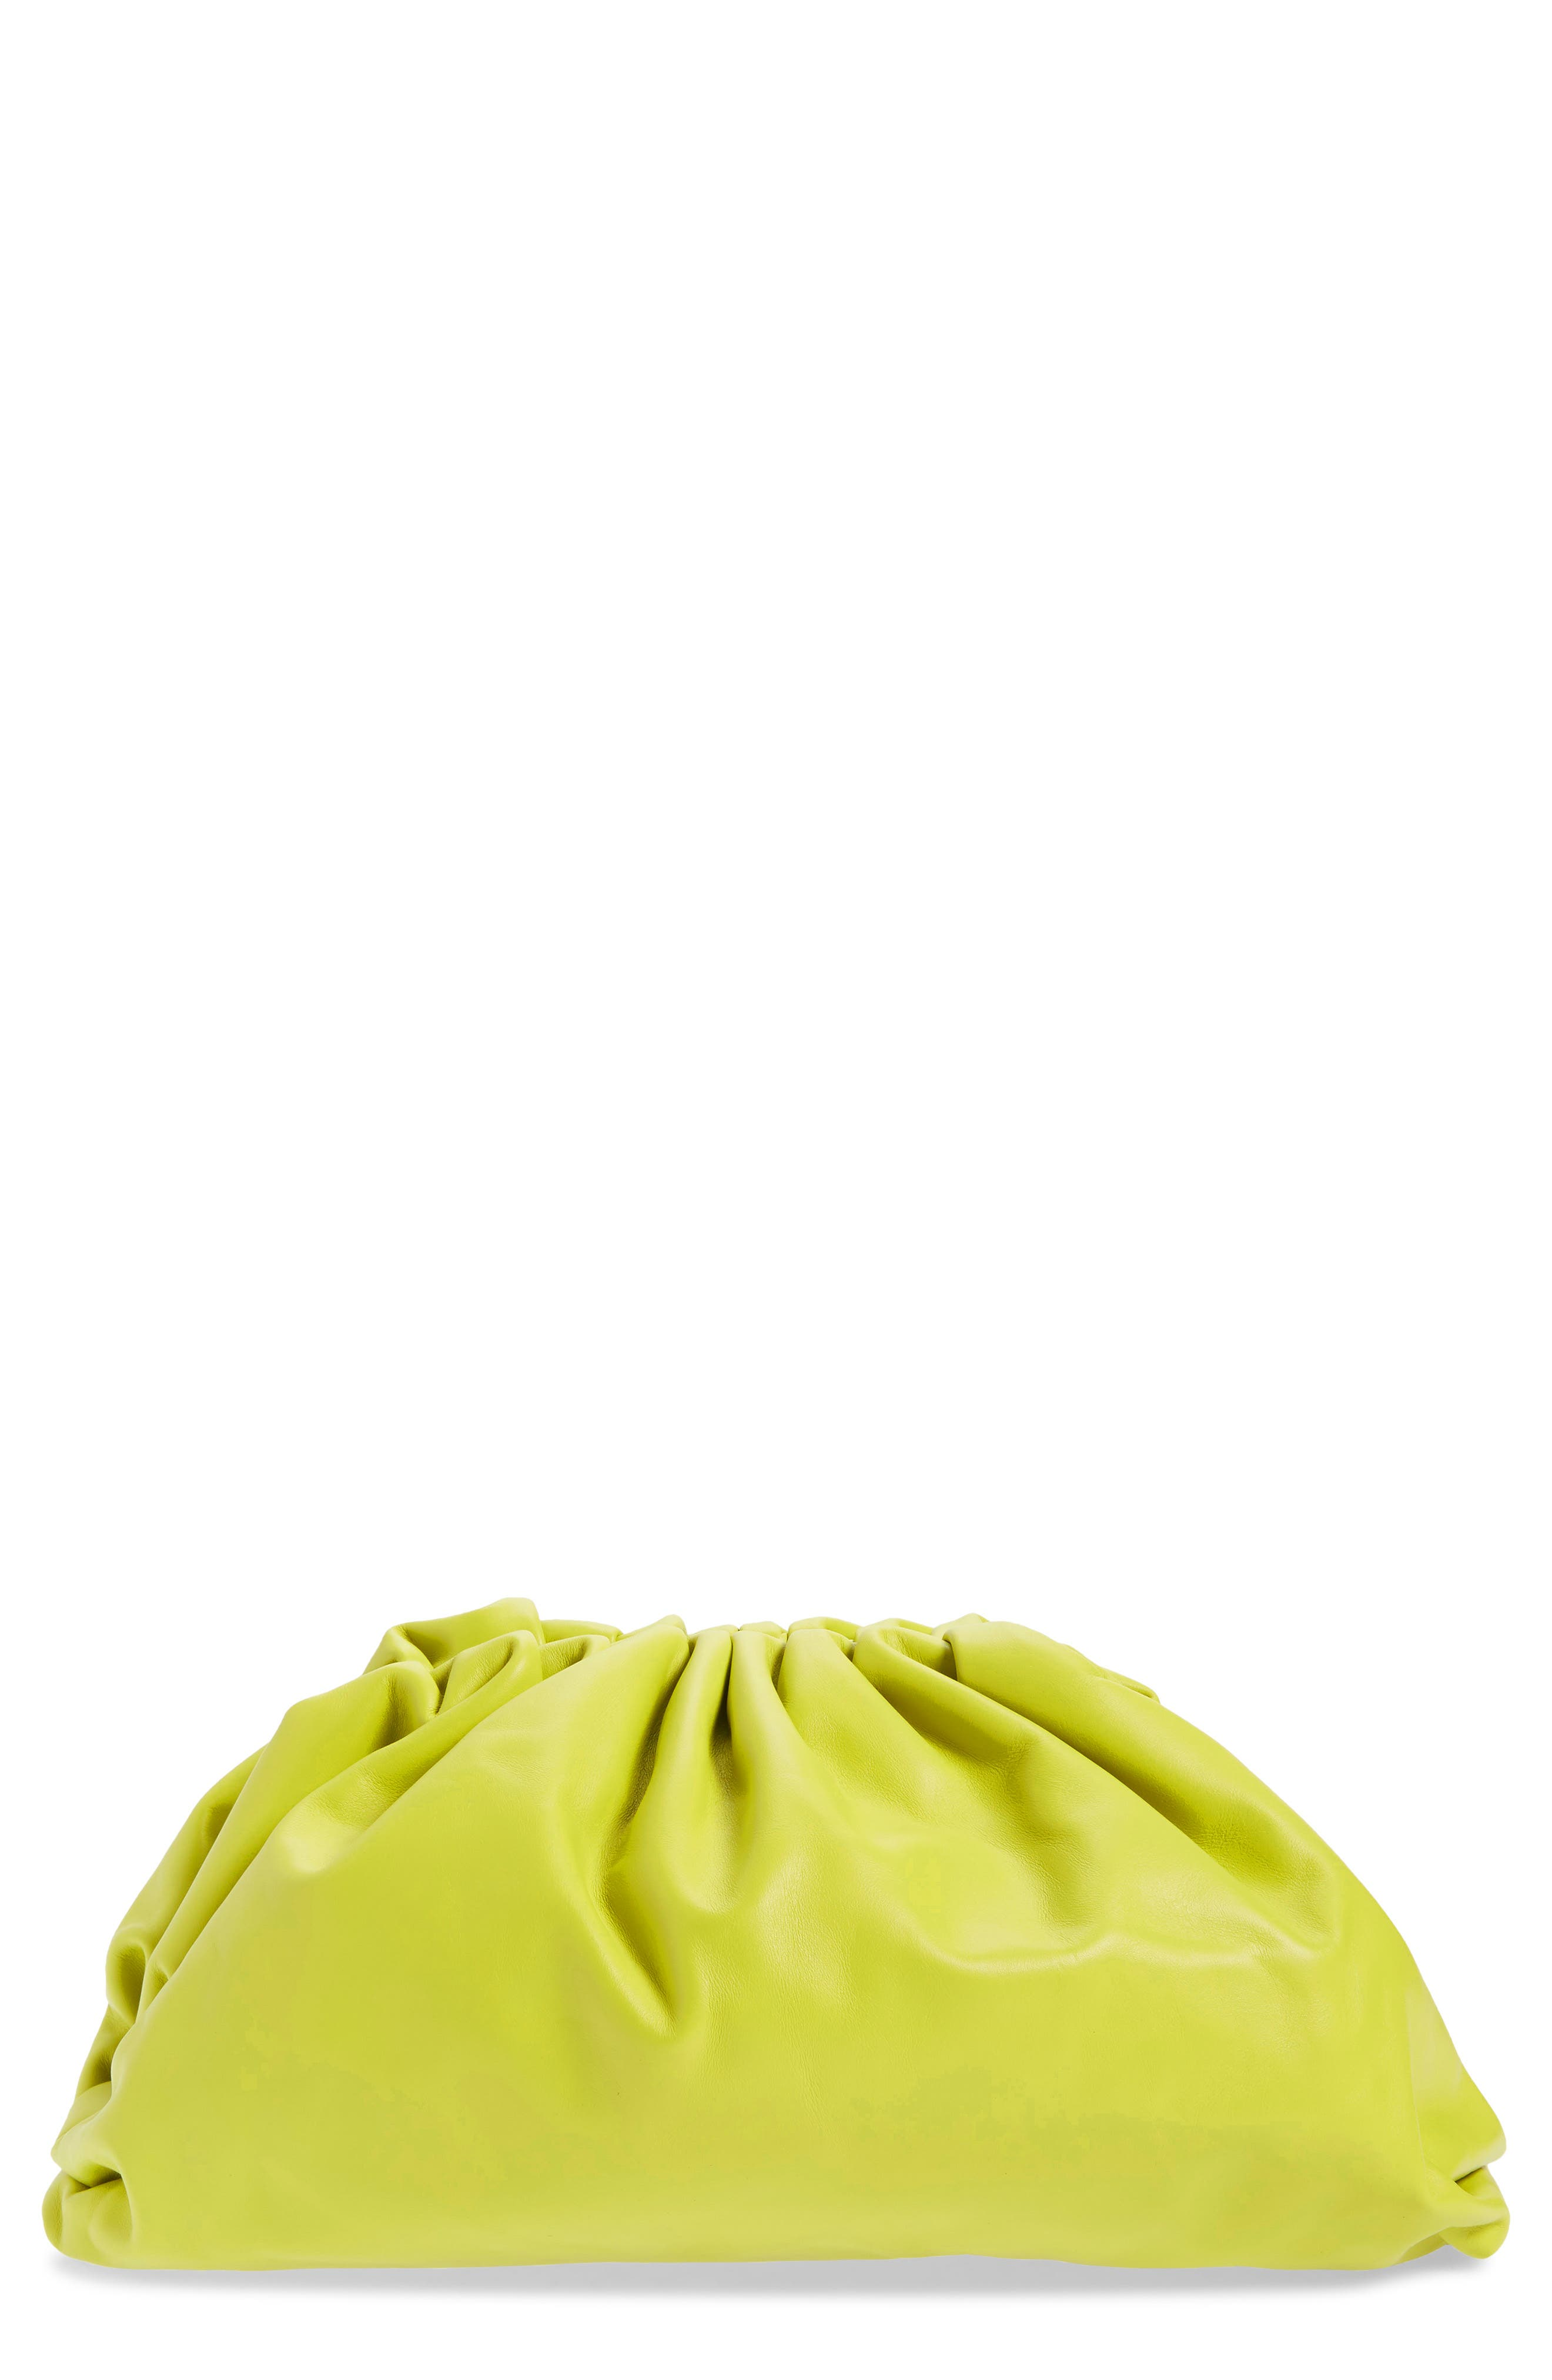 Bottega Veneta The Pouch Leather Clutch | Nordstrom